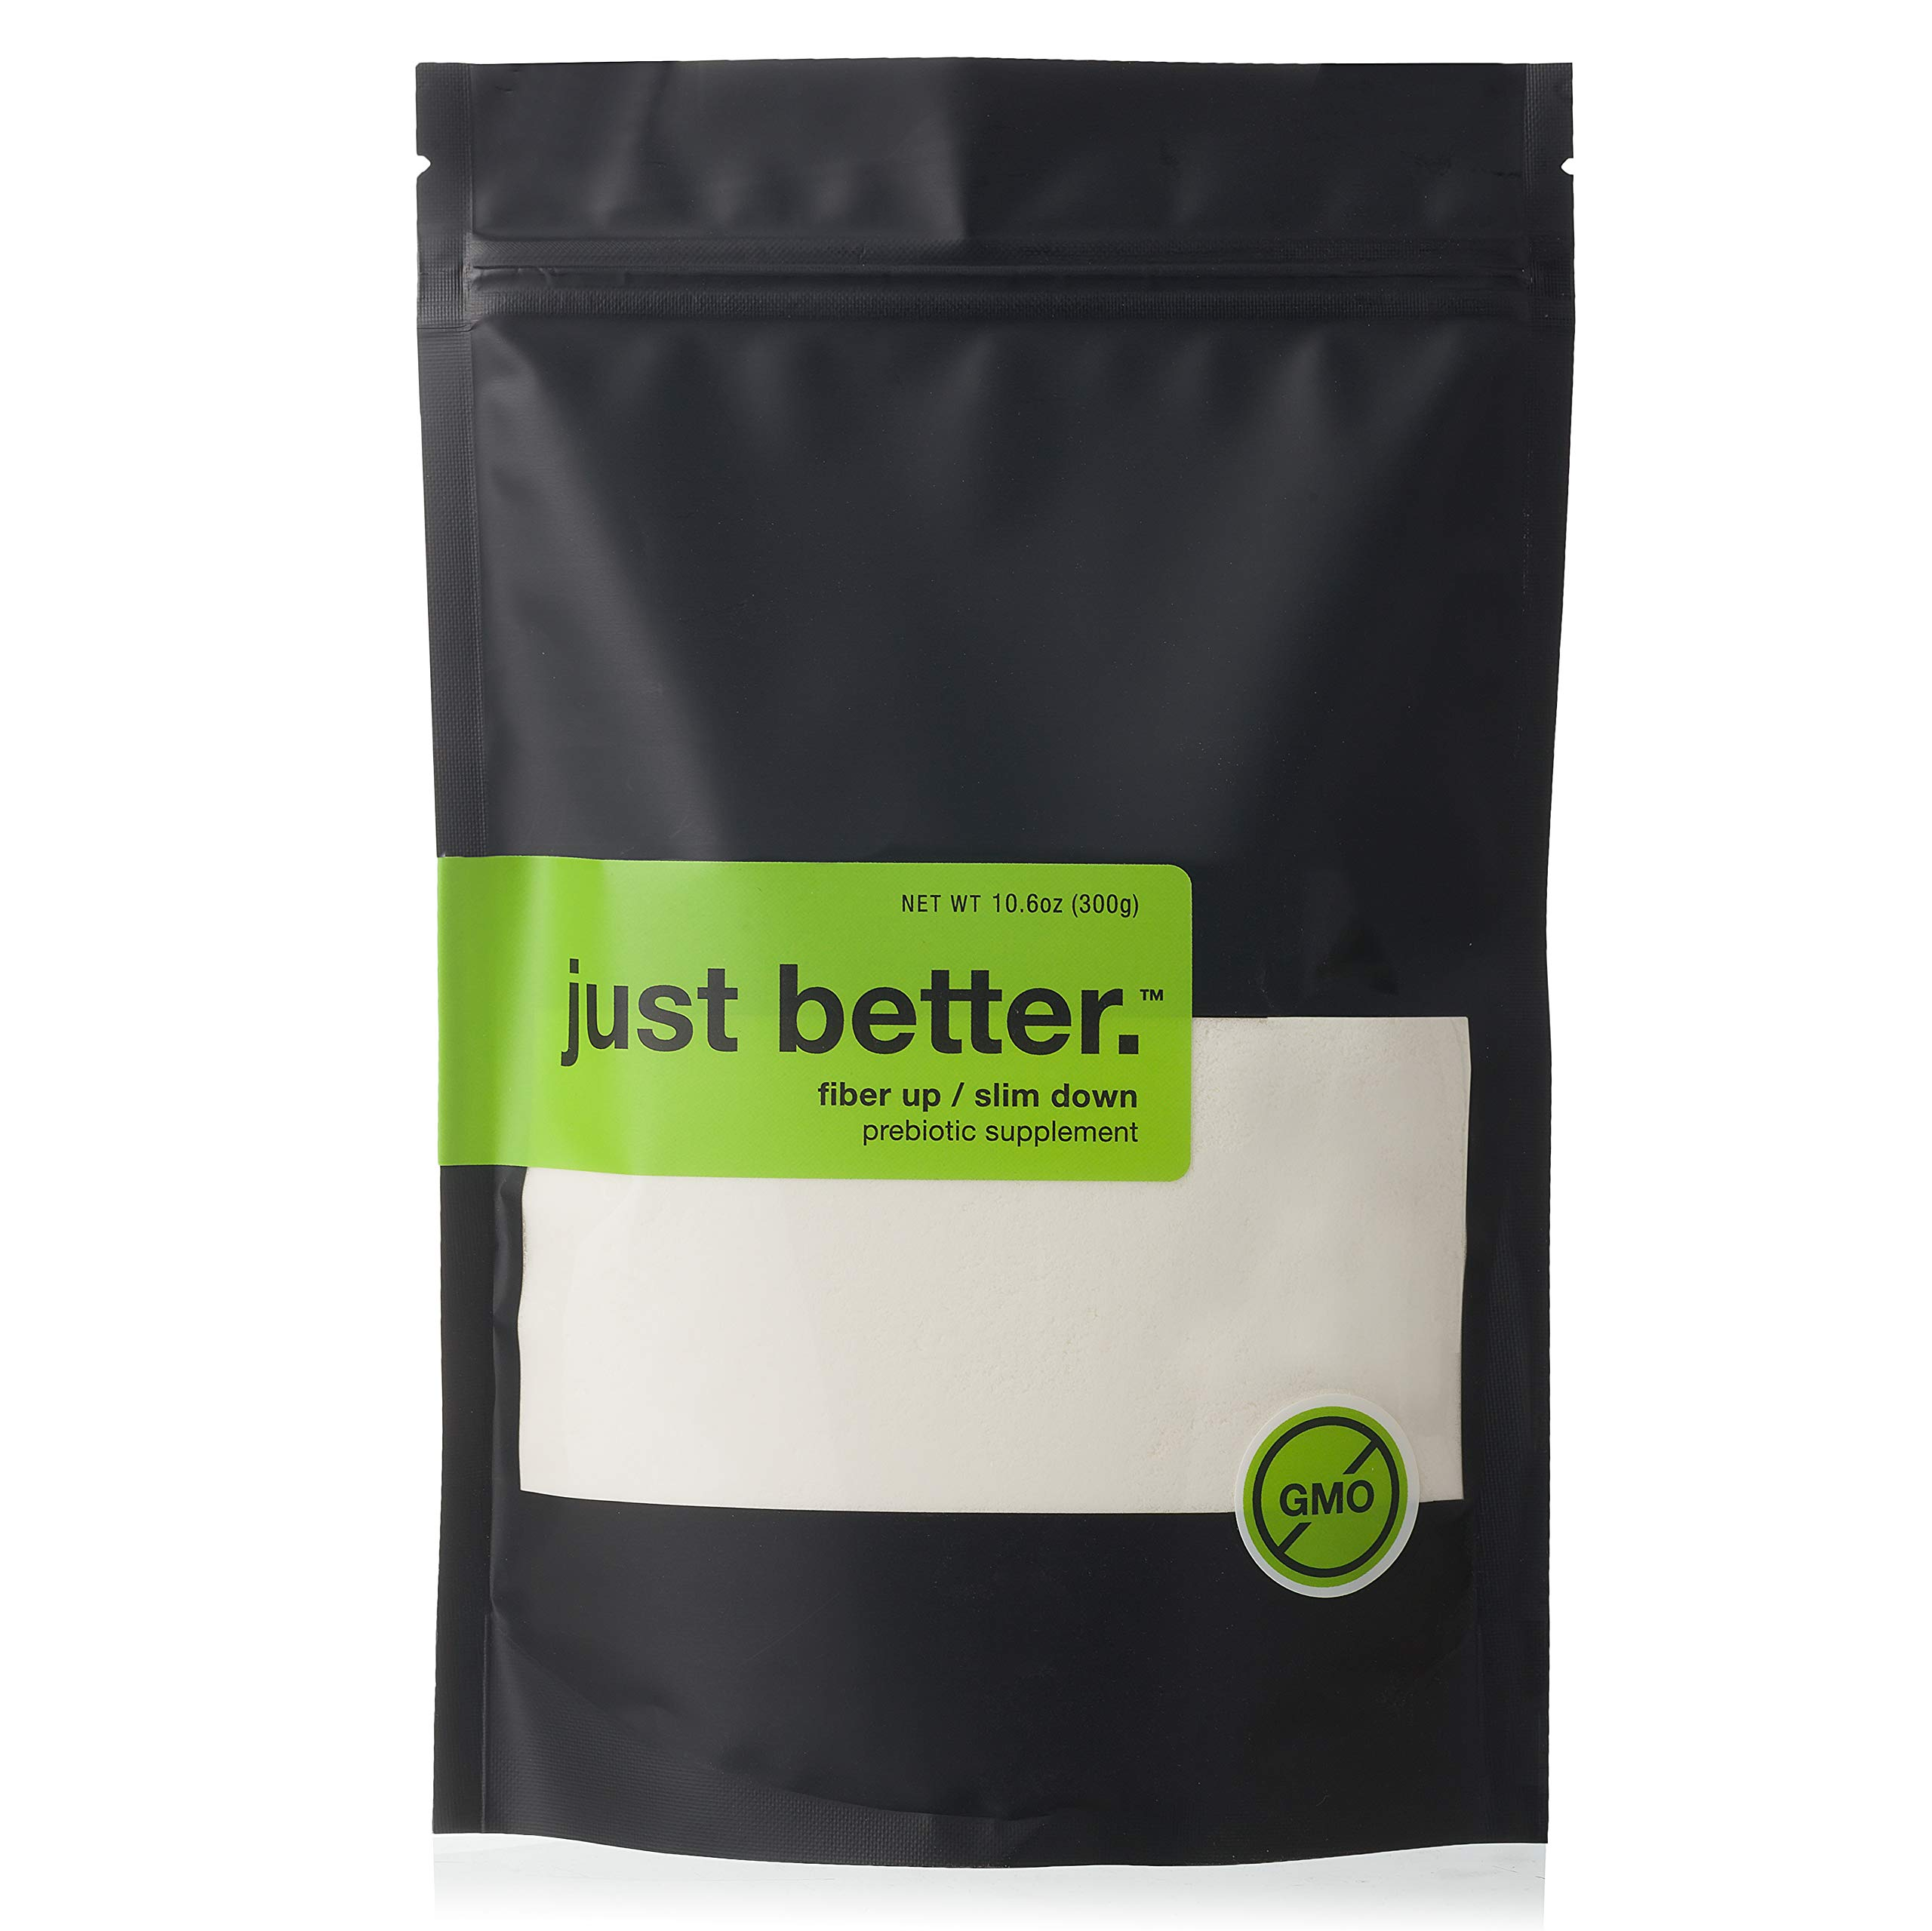 Just Better. Prebiotic Fiber Supplement Powder - 50 Serving (300g) Pouch